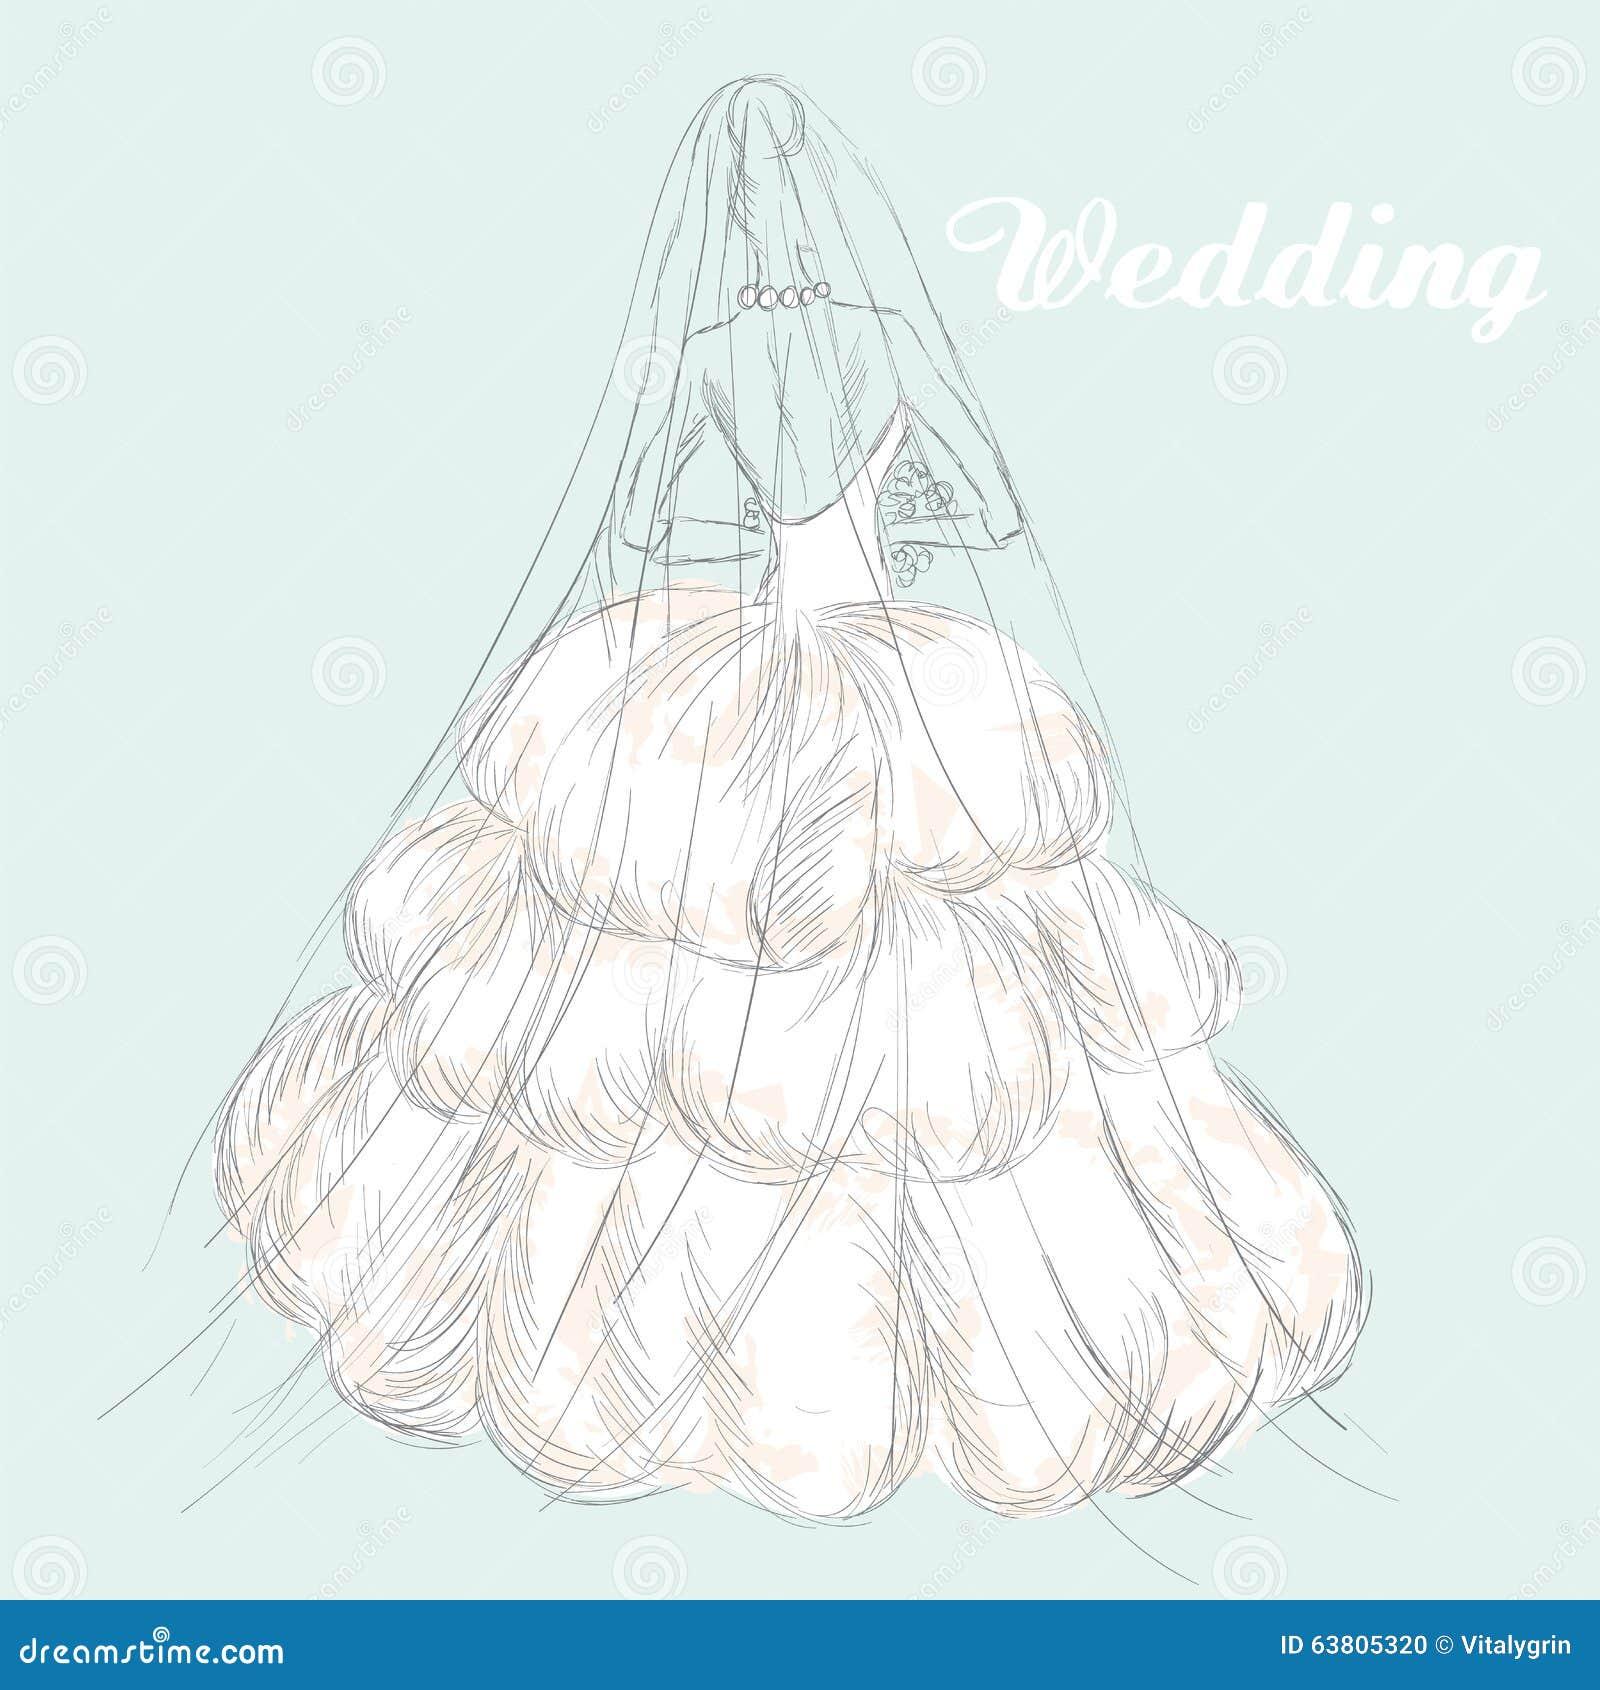 Dessin de main d 39 une robe de mariage la fille dans une robe de mariage cru illustration de - Dessin de la main ...